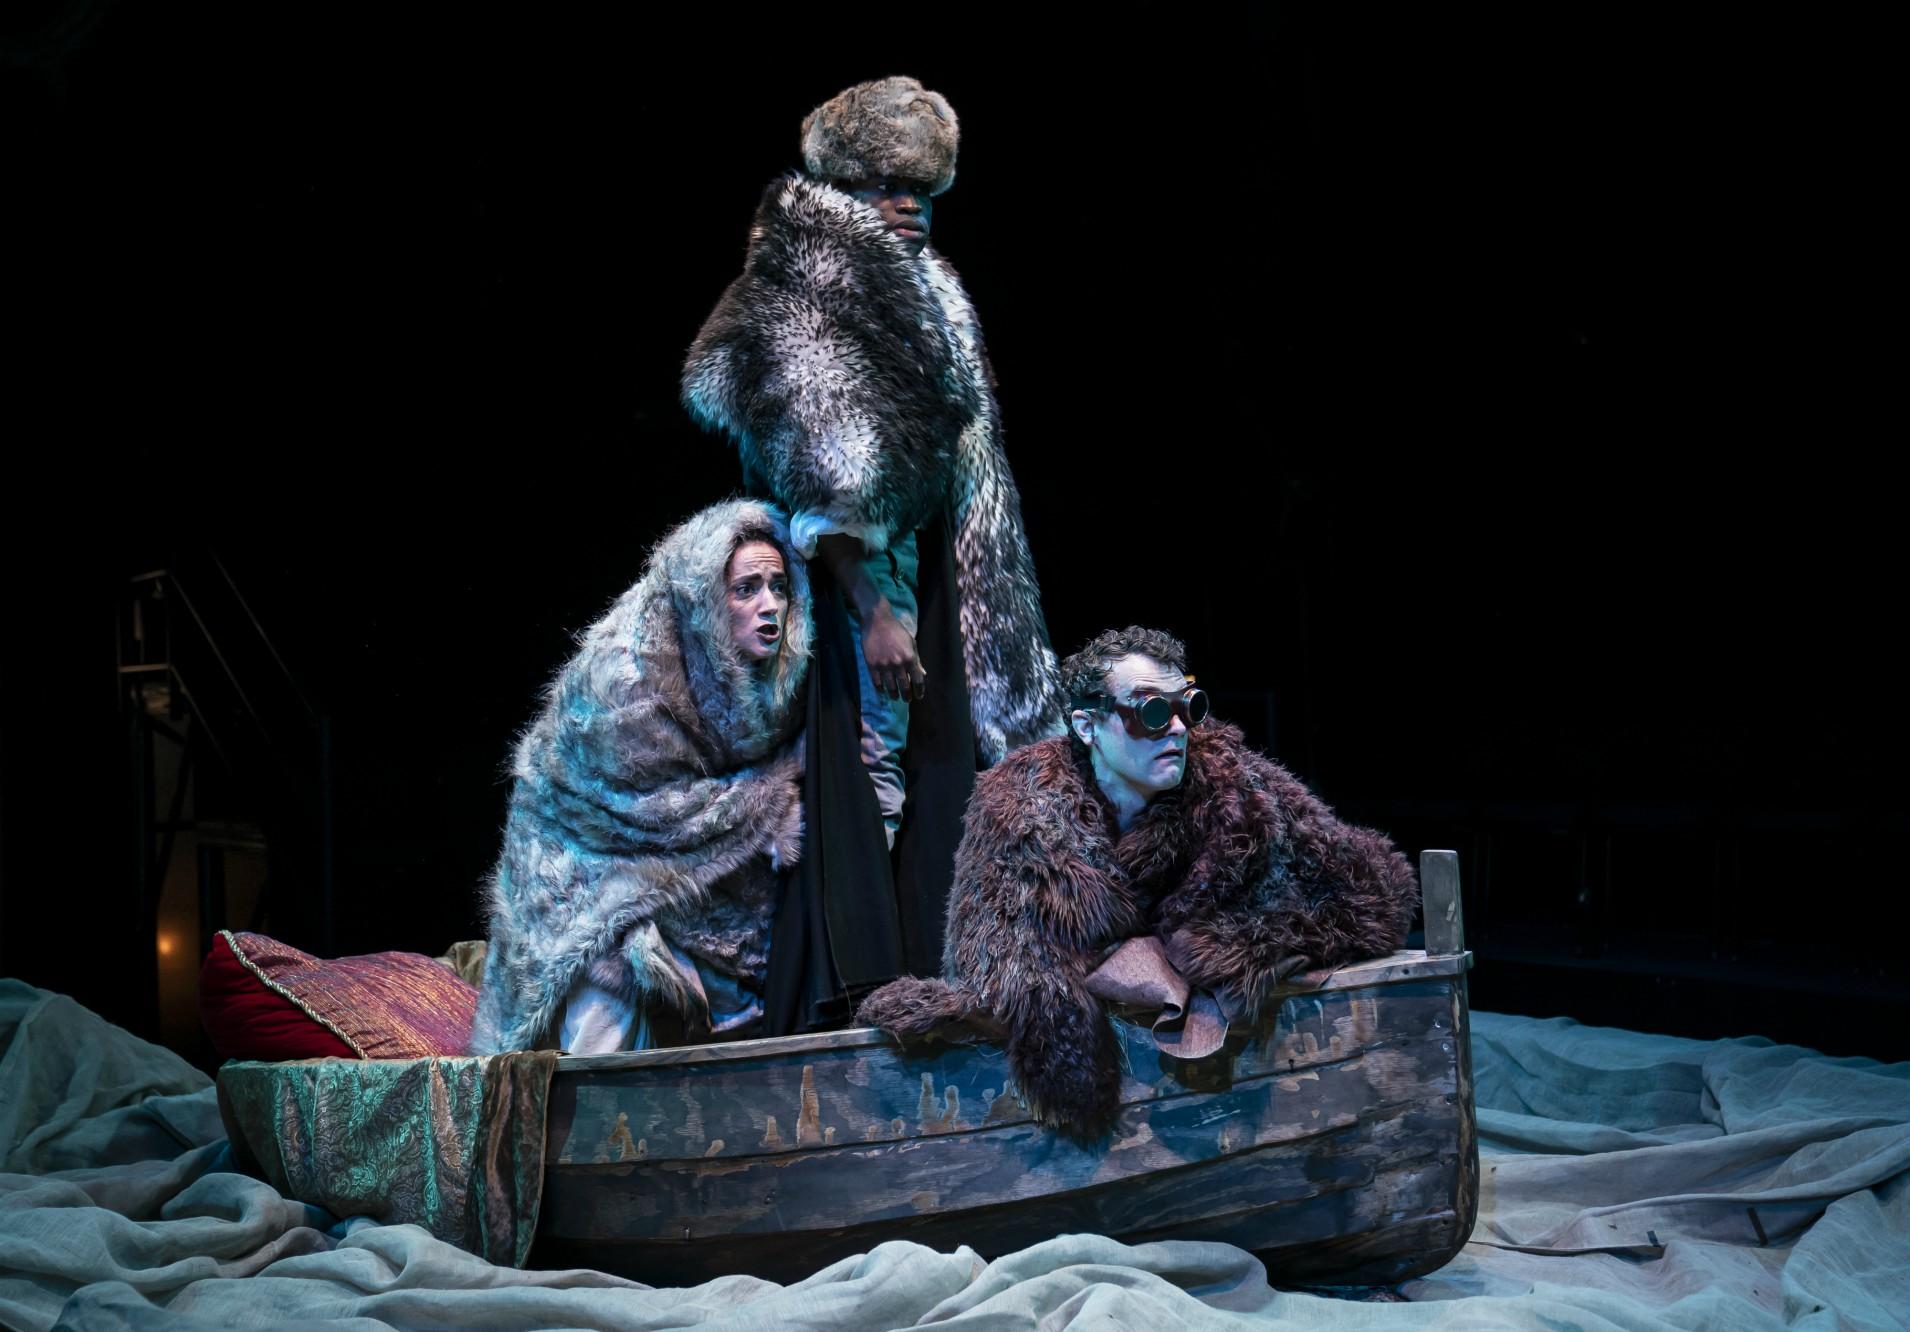 PicksInSix Review: Mary Shelley's Frankenstein